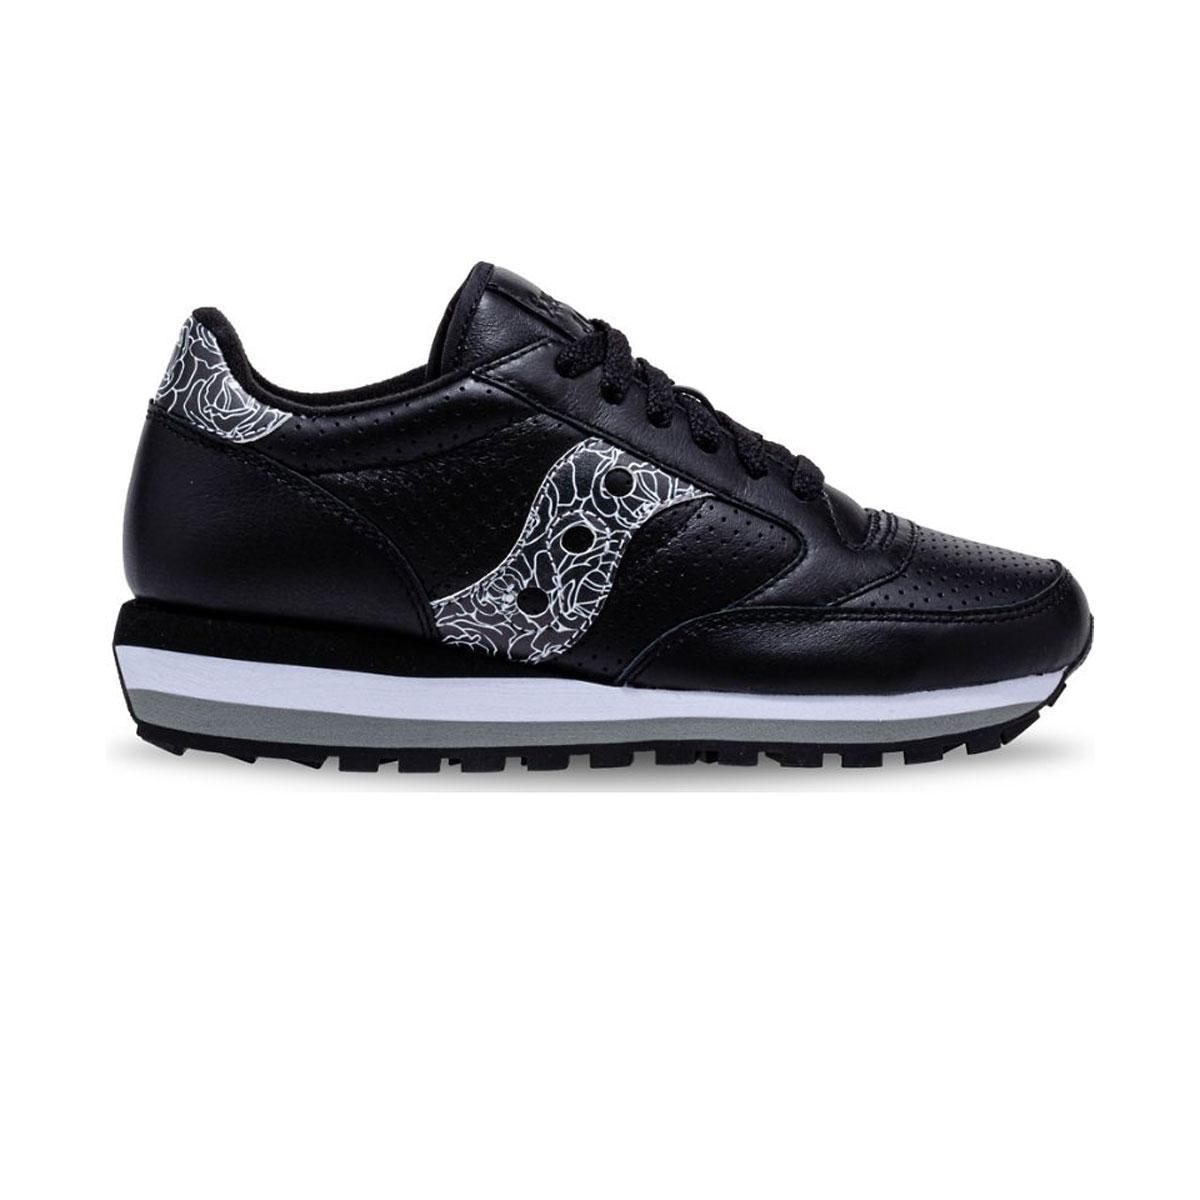 Scarpe Sneakers Saucony Jazz Triple Limited Edition da donna rif. S60497-9